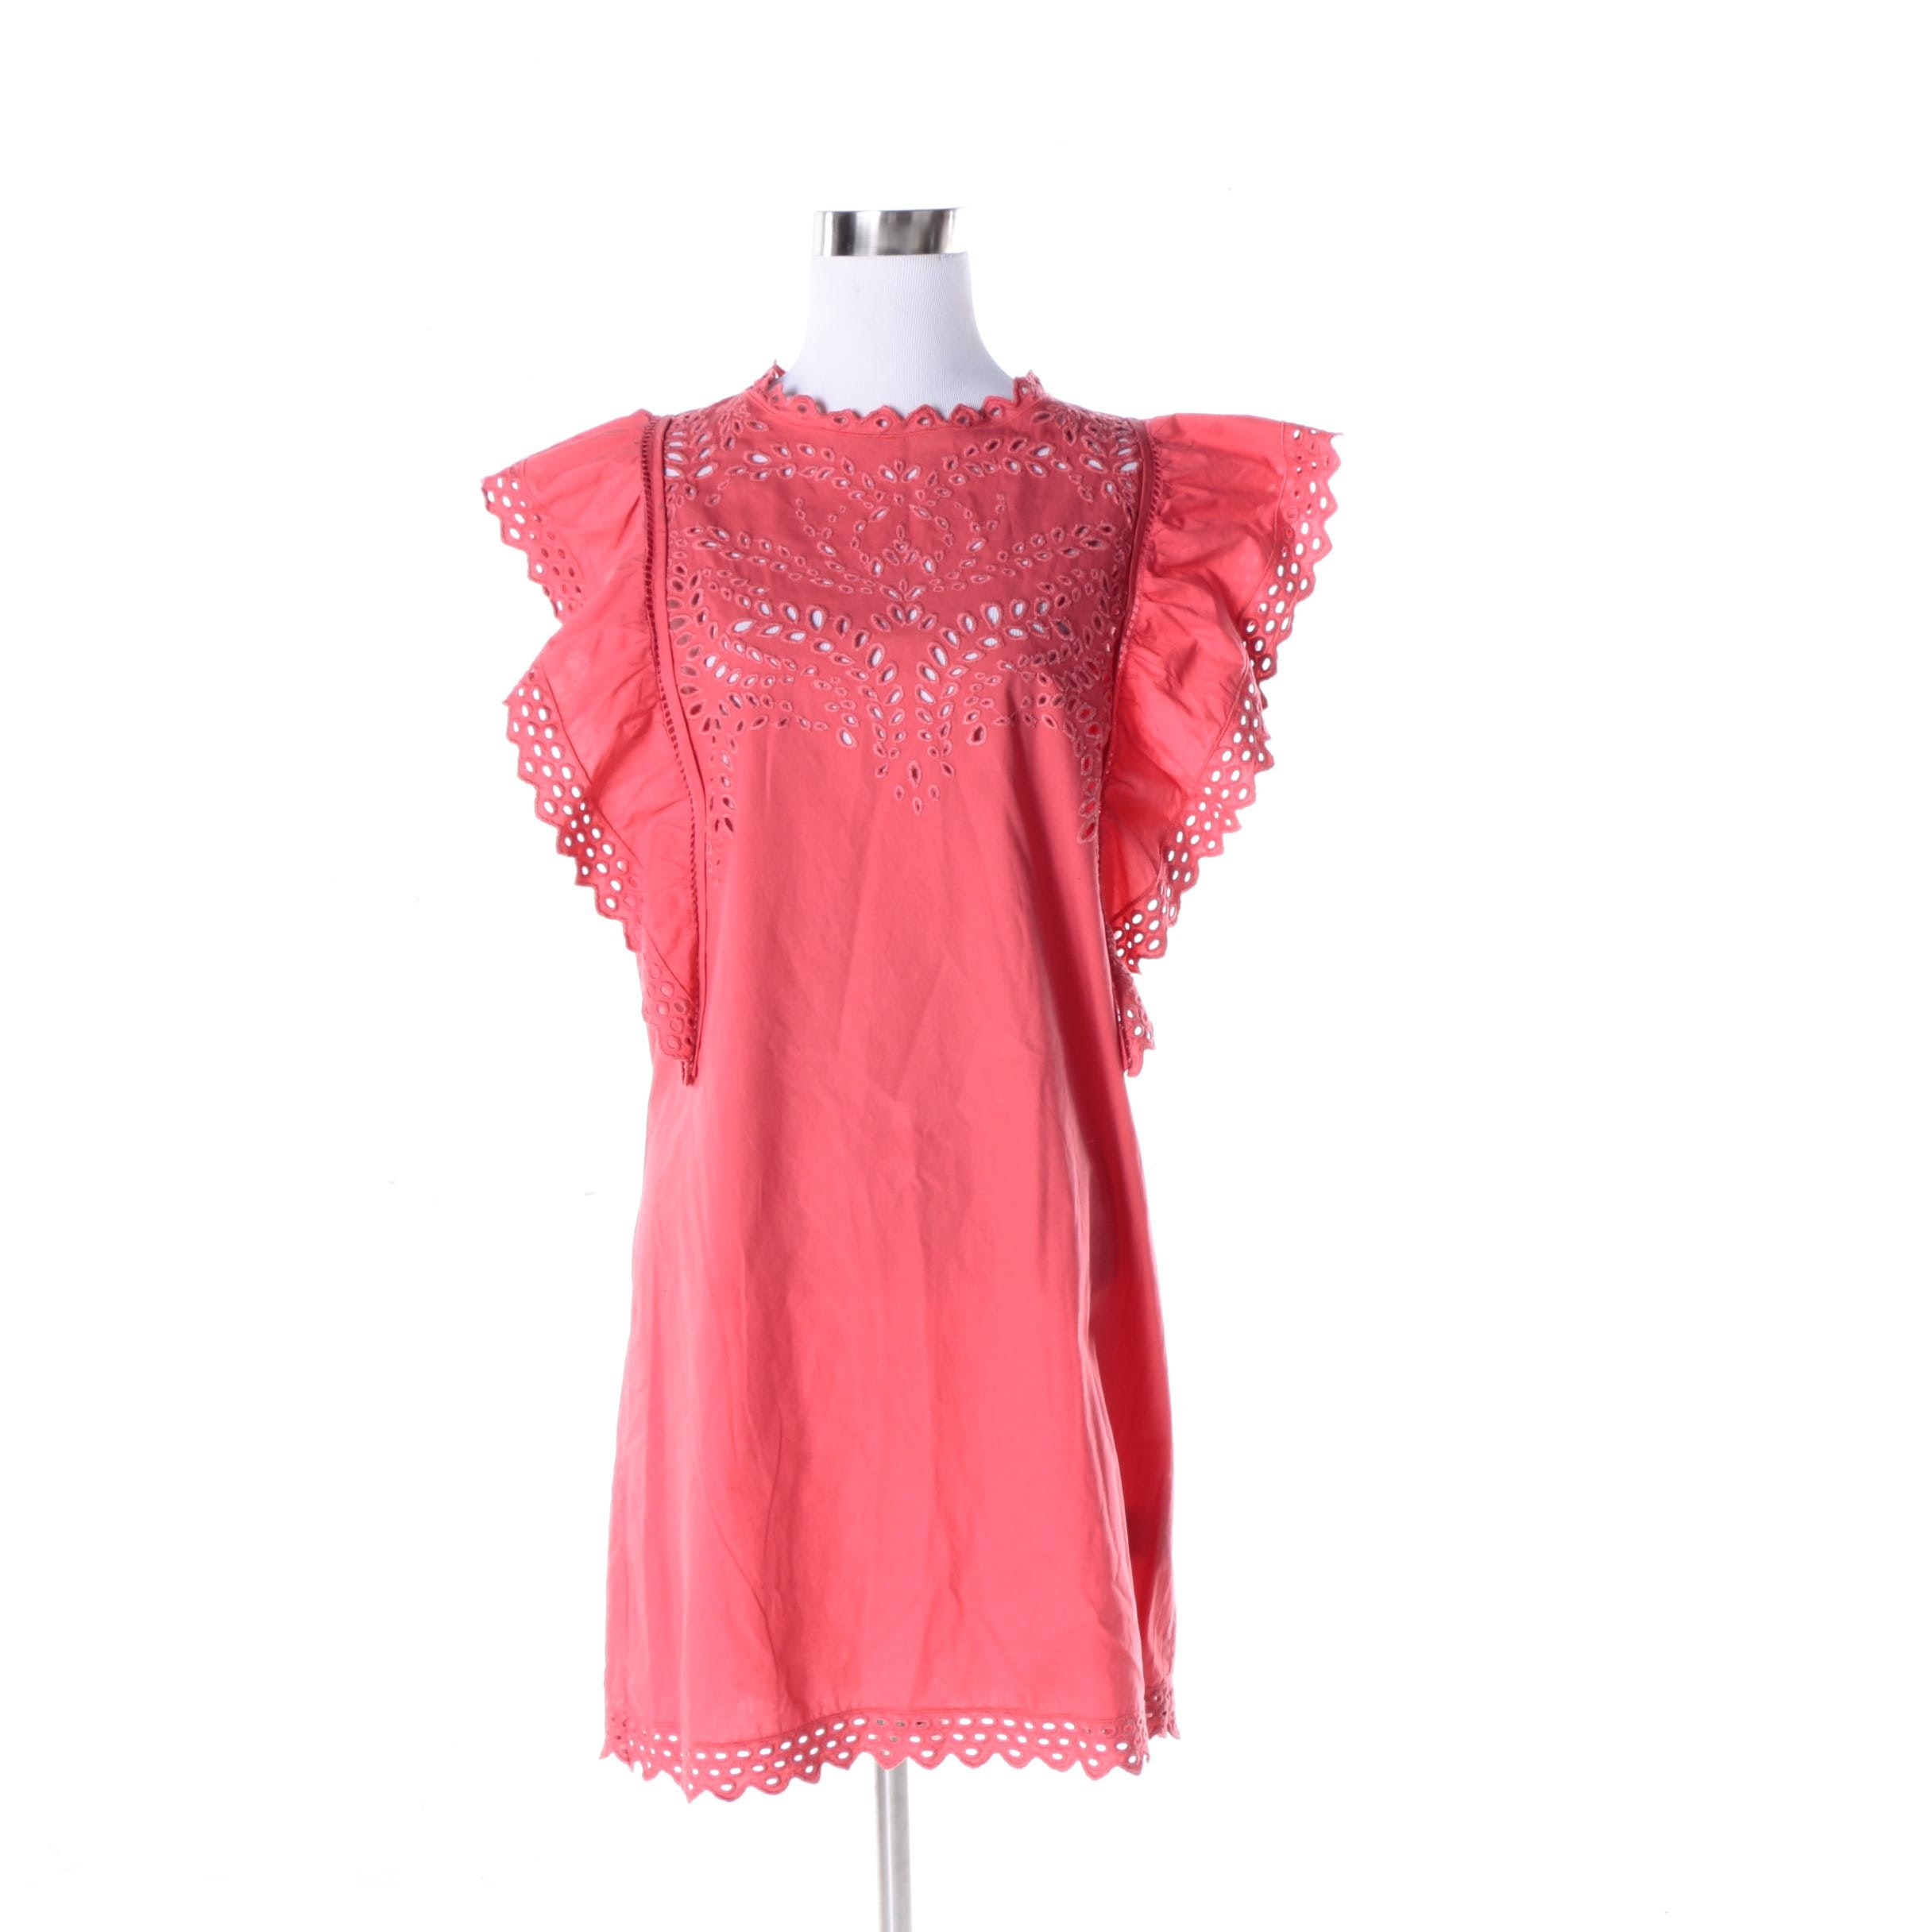 Women's Isabel Marant Etoile Pink Blouse